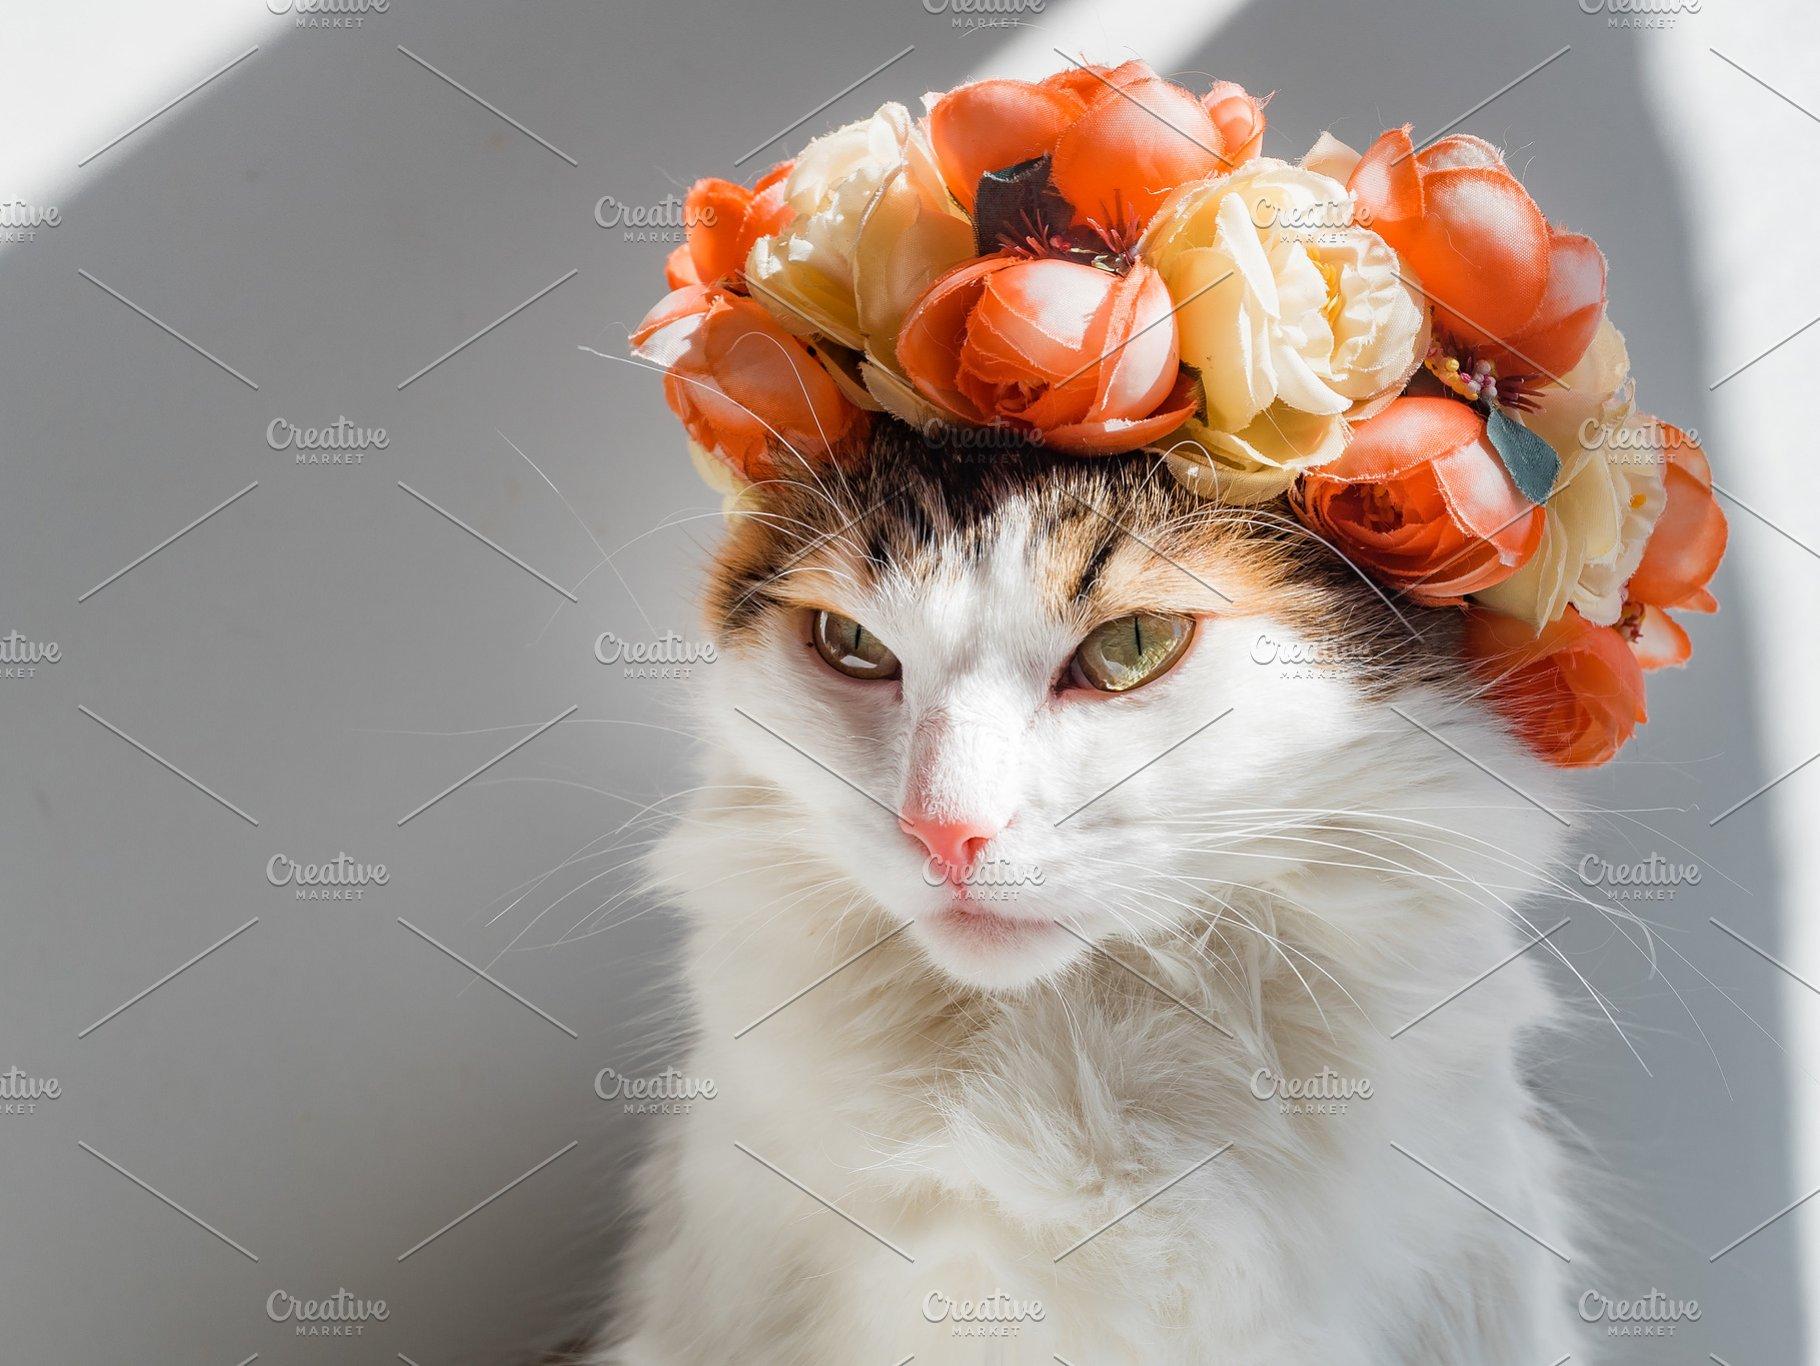 Beautiful Calico Cat with a wreath o